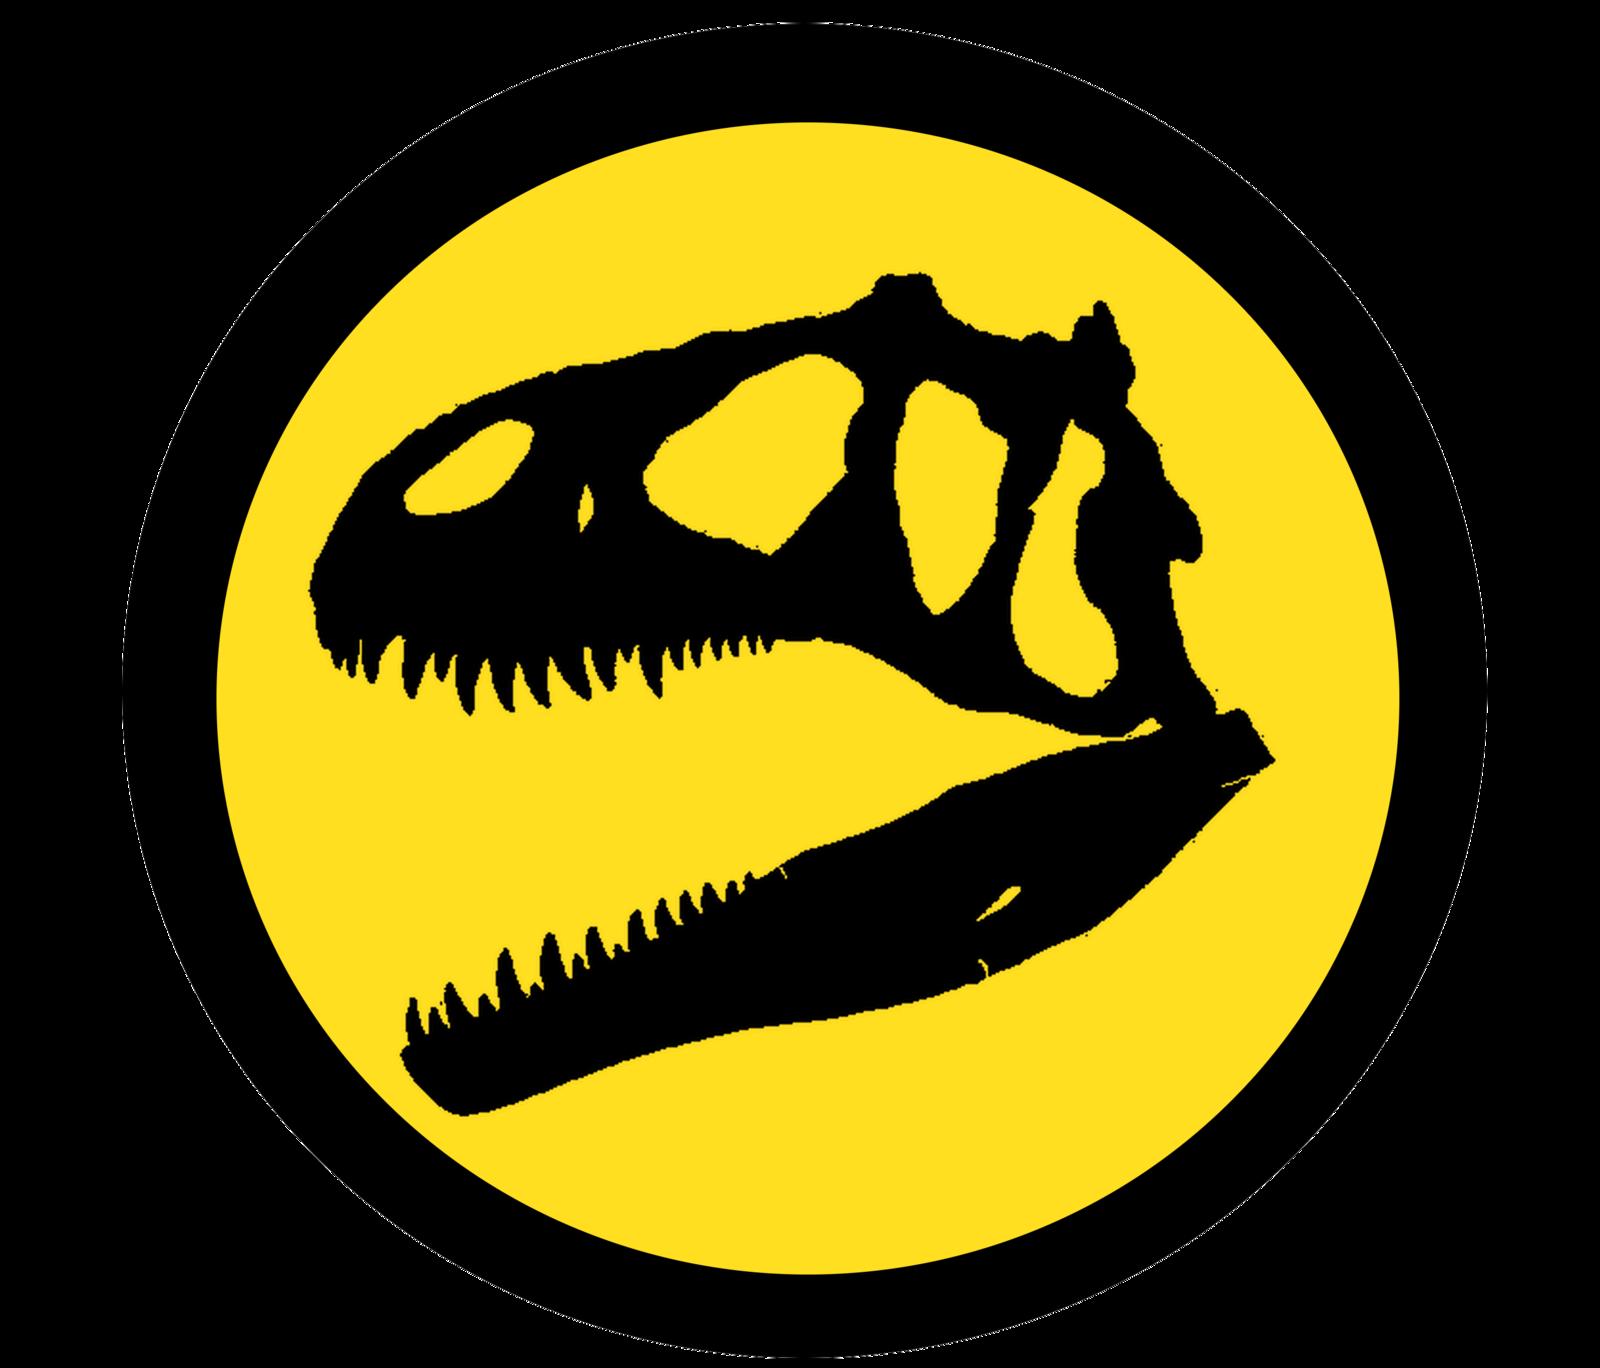 Library of jurassic park logo jpg black and white download ...